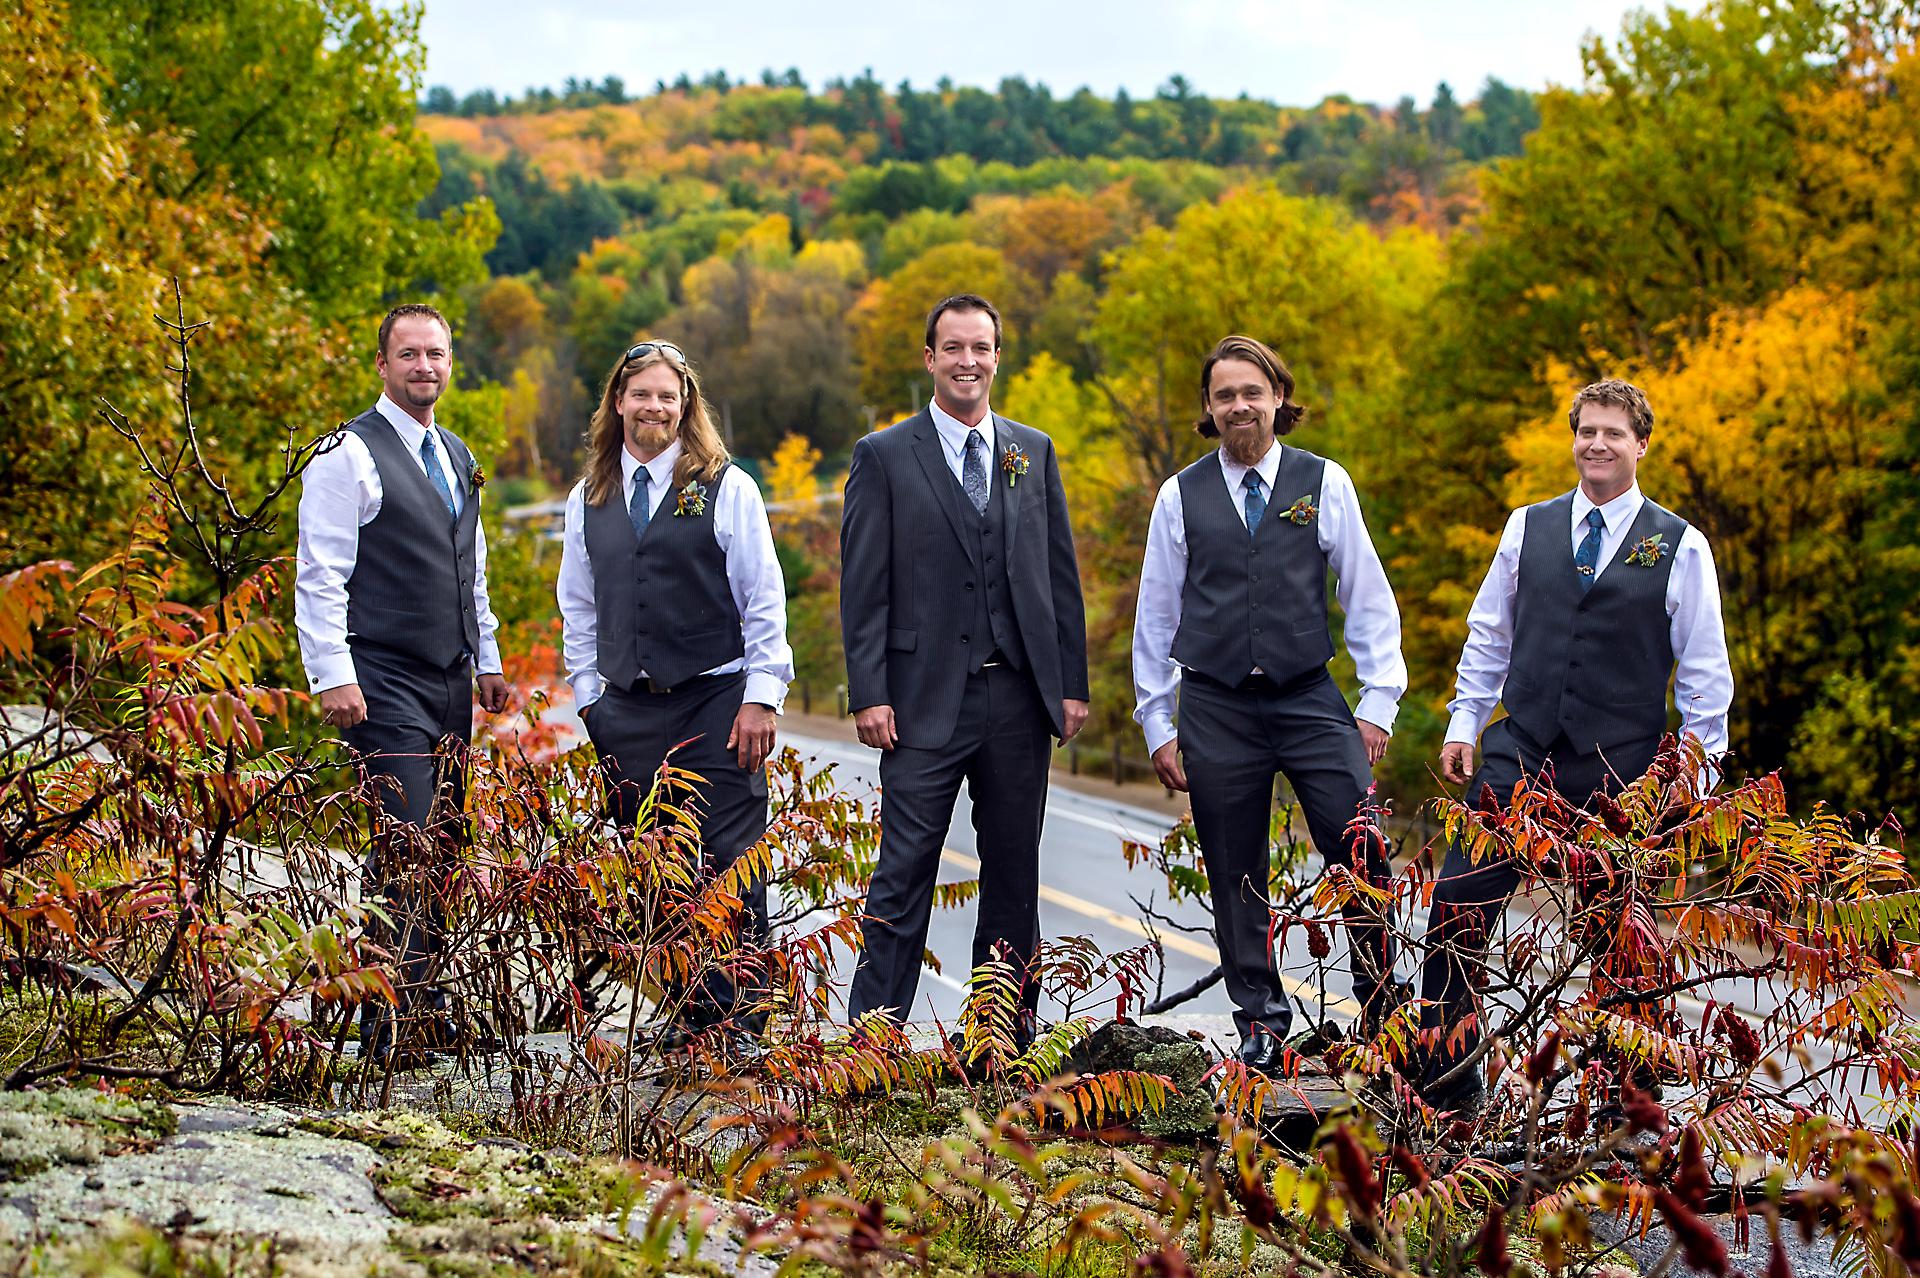 Nathan & Linda | Brooksfield Farms Wedding | Muskoka Wedding Photography16